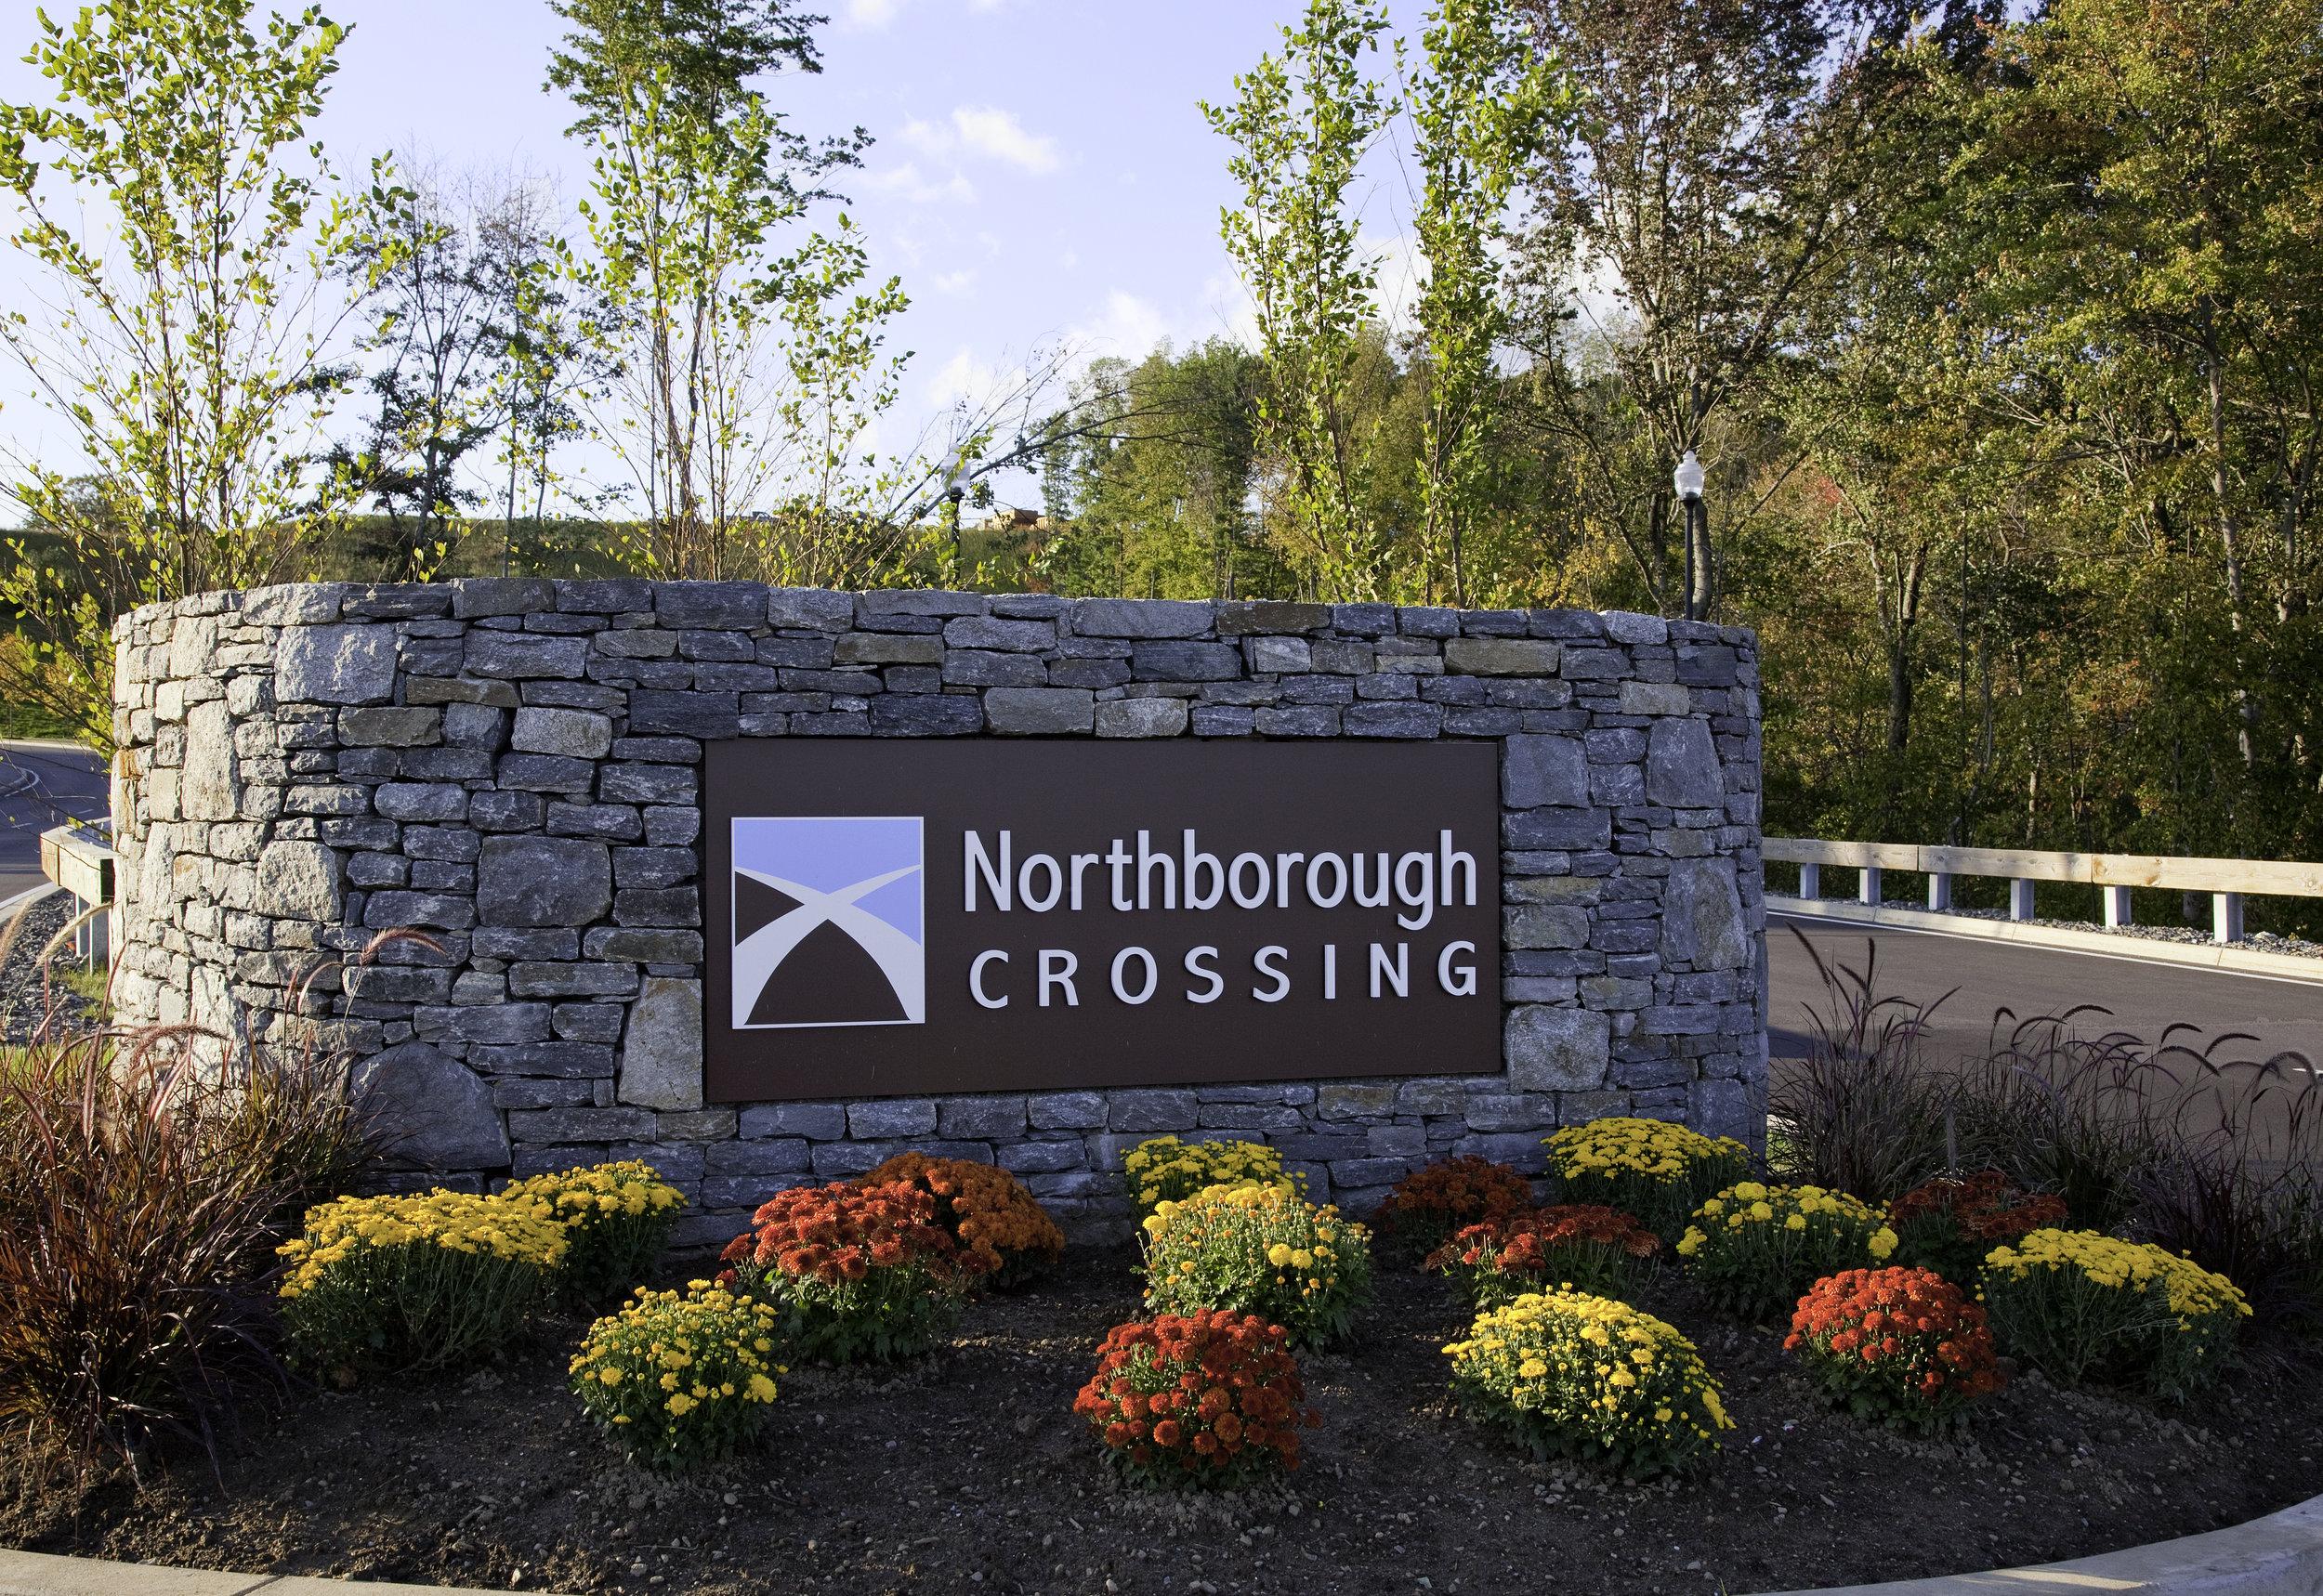 111005_Northborough_Crossing_116.jpg